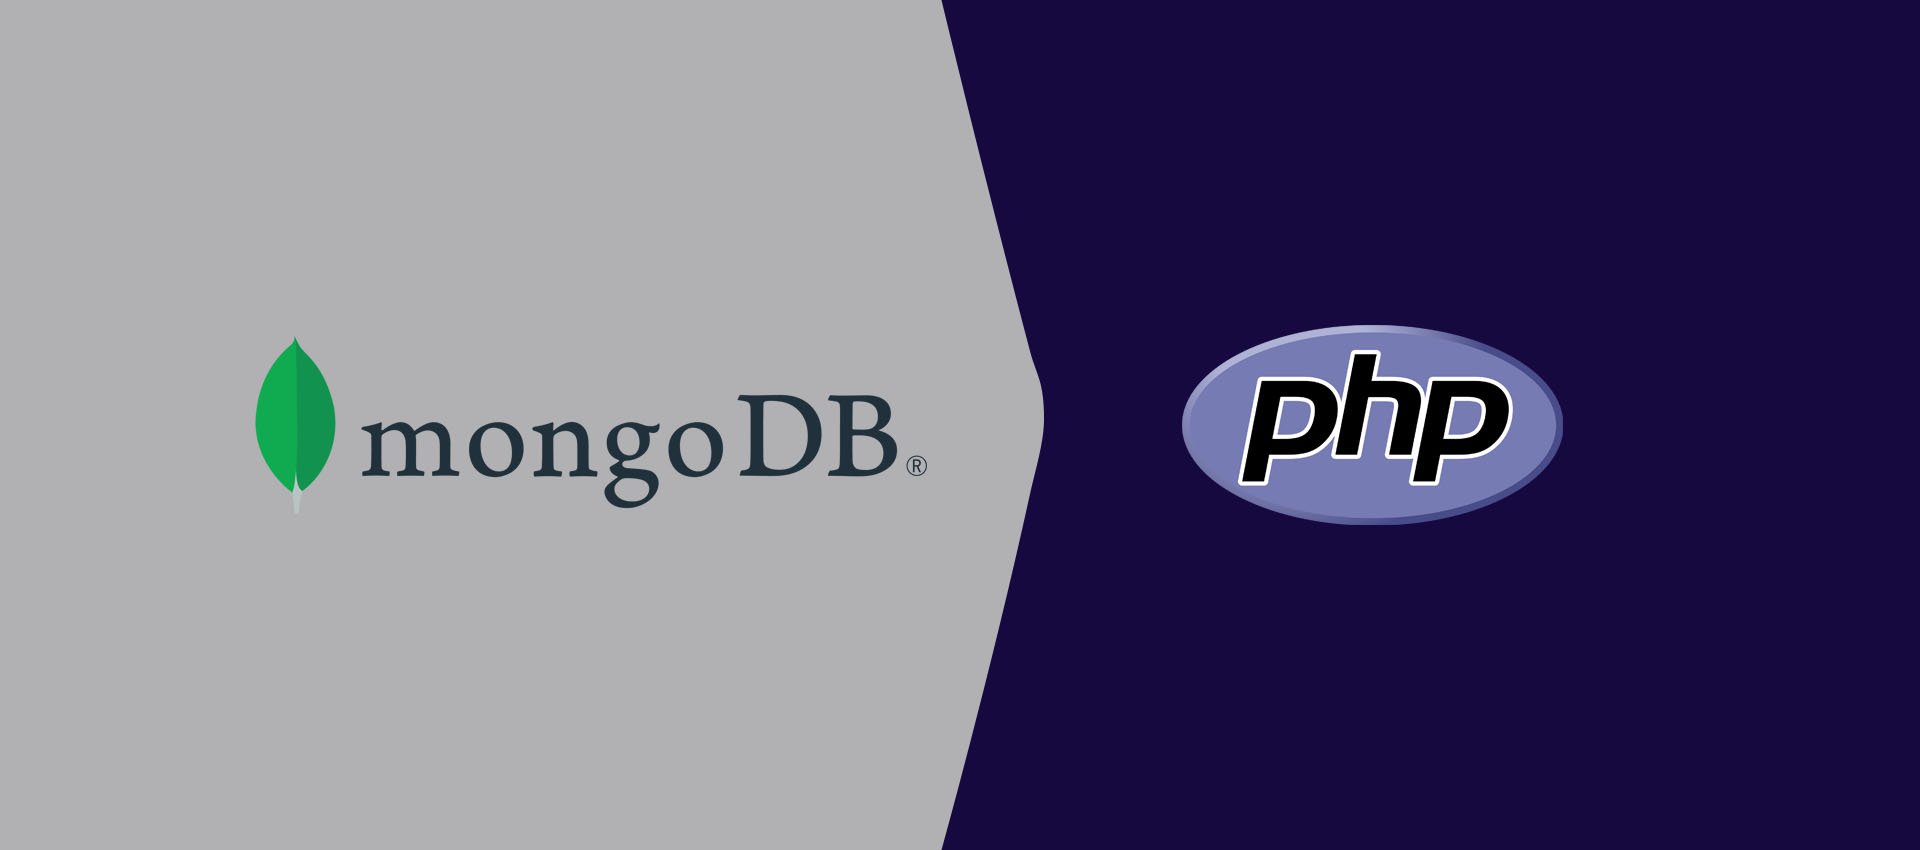 How To Configure MongoDB for PHP on Windows and Ubuntu